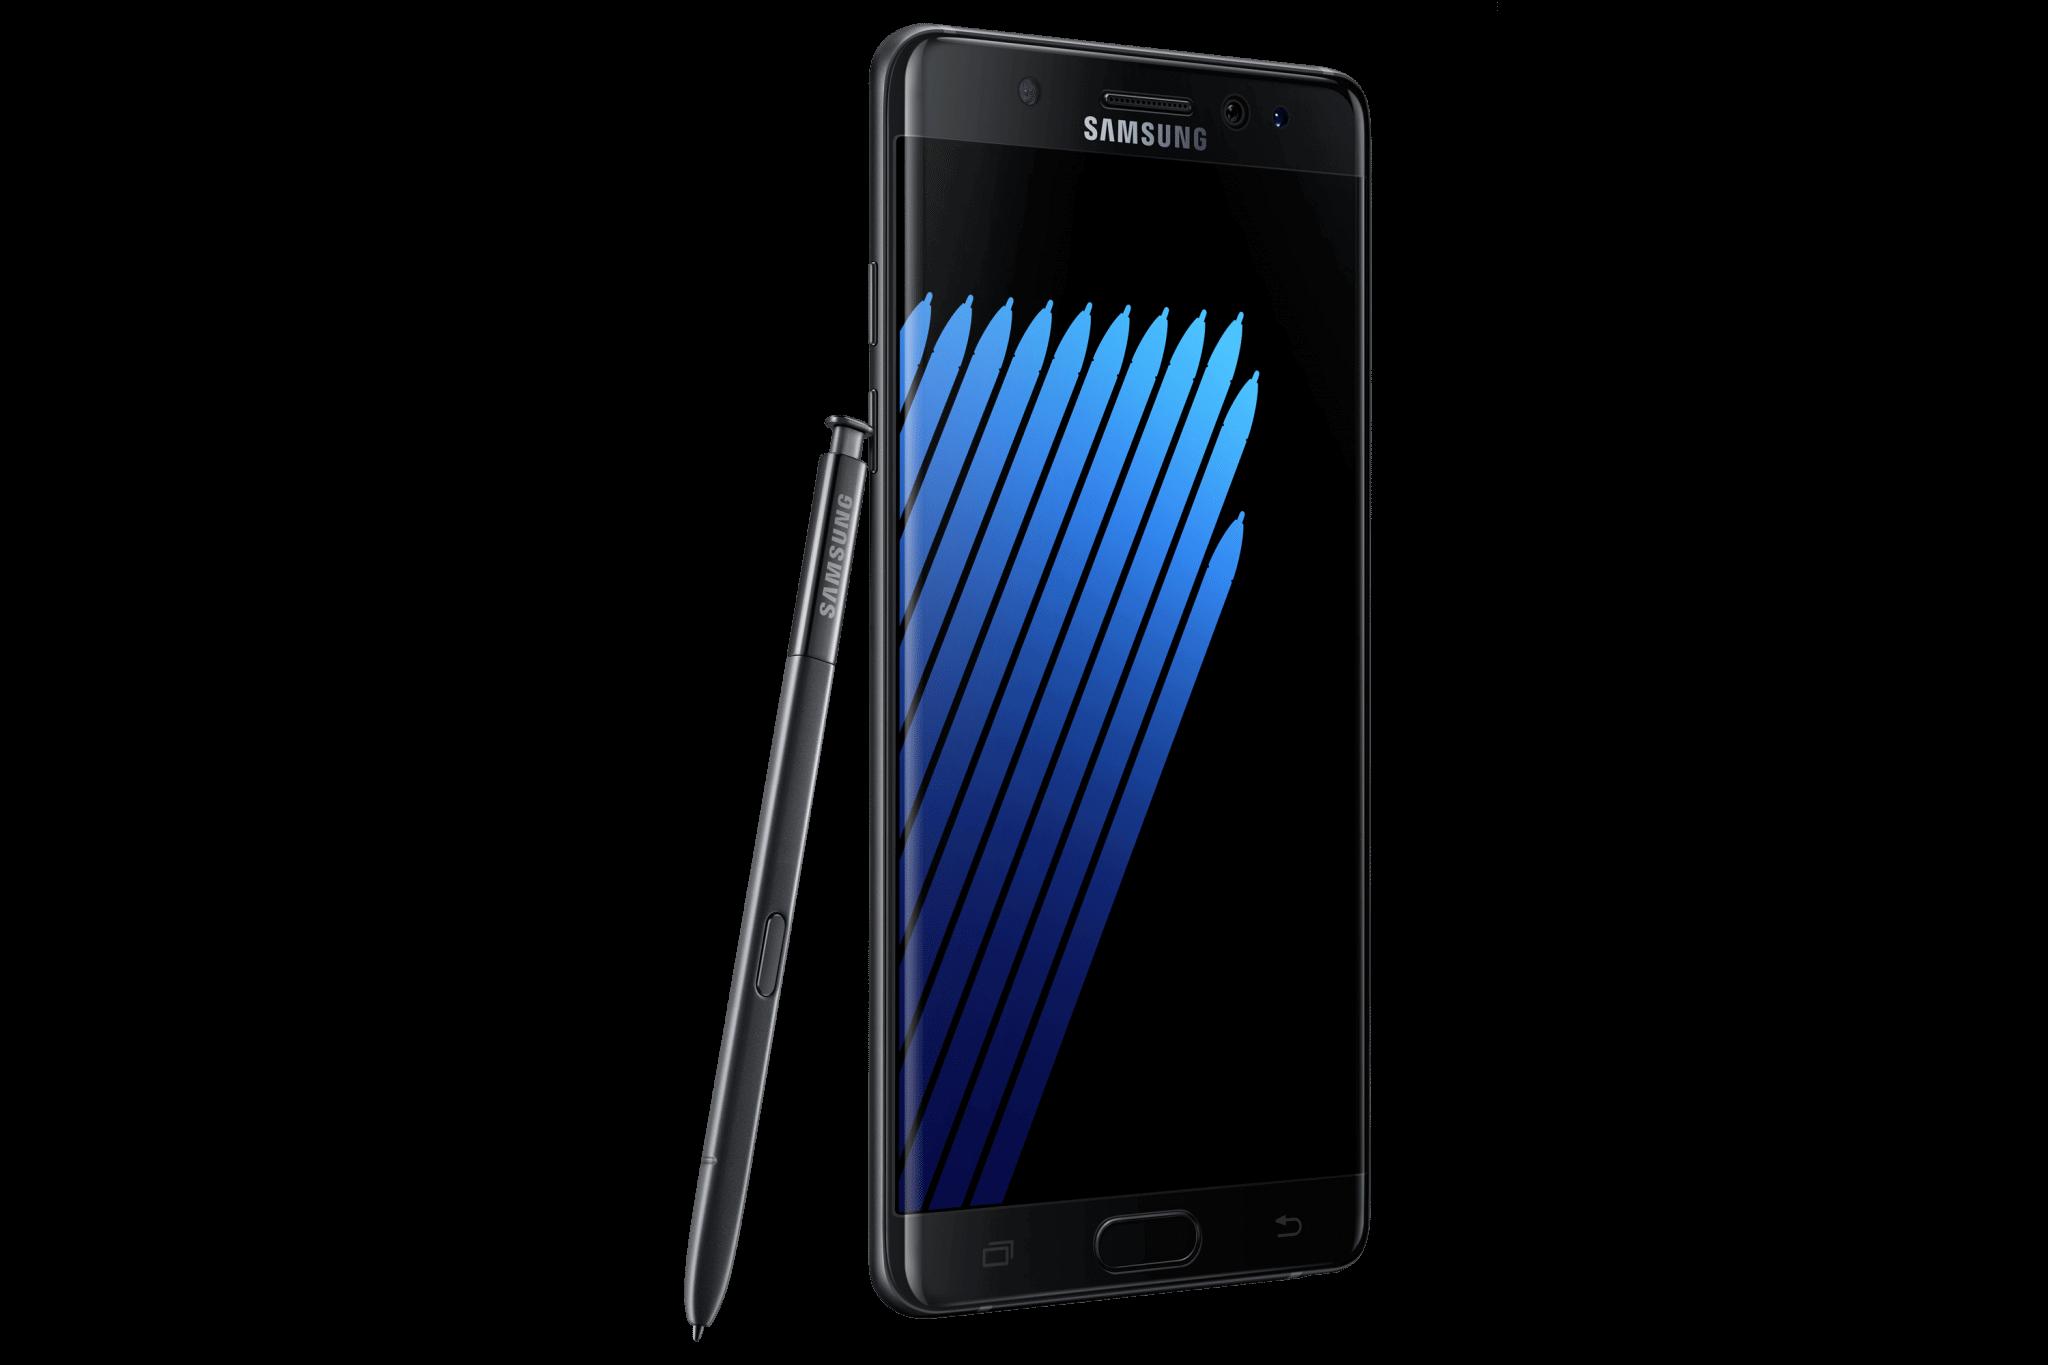 03 Galaxy Note7 black - Samsung promete Android Nougat para Galaxy Note7 em três meses